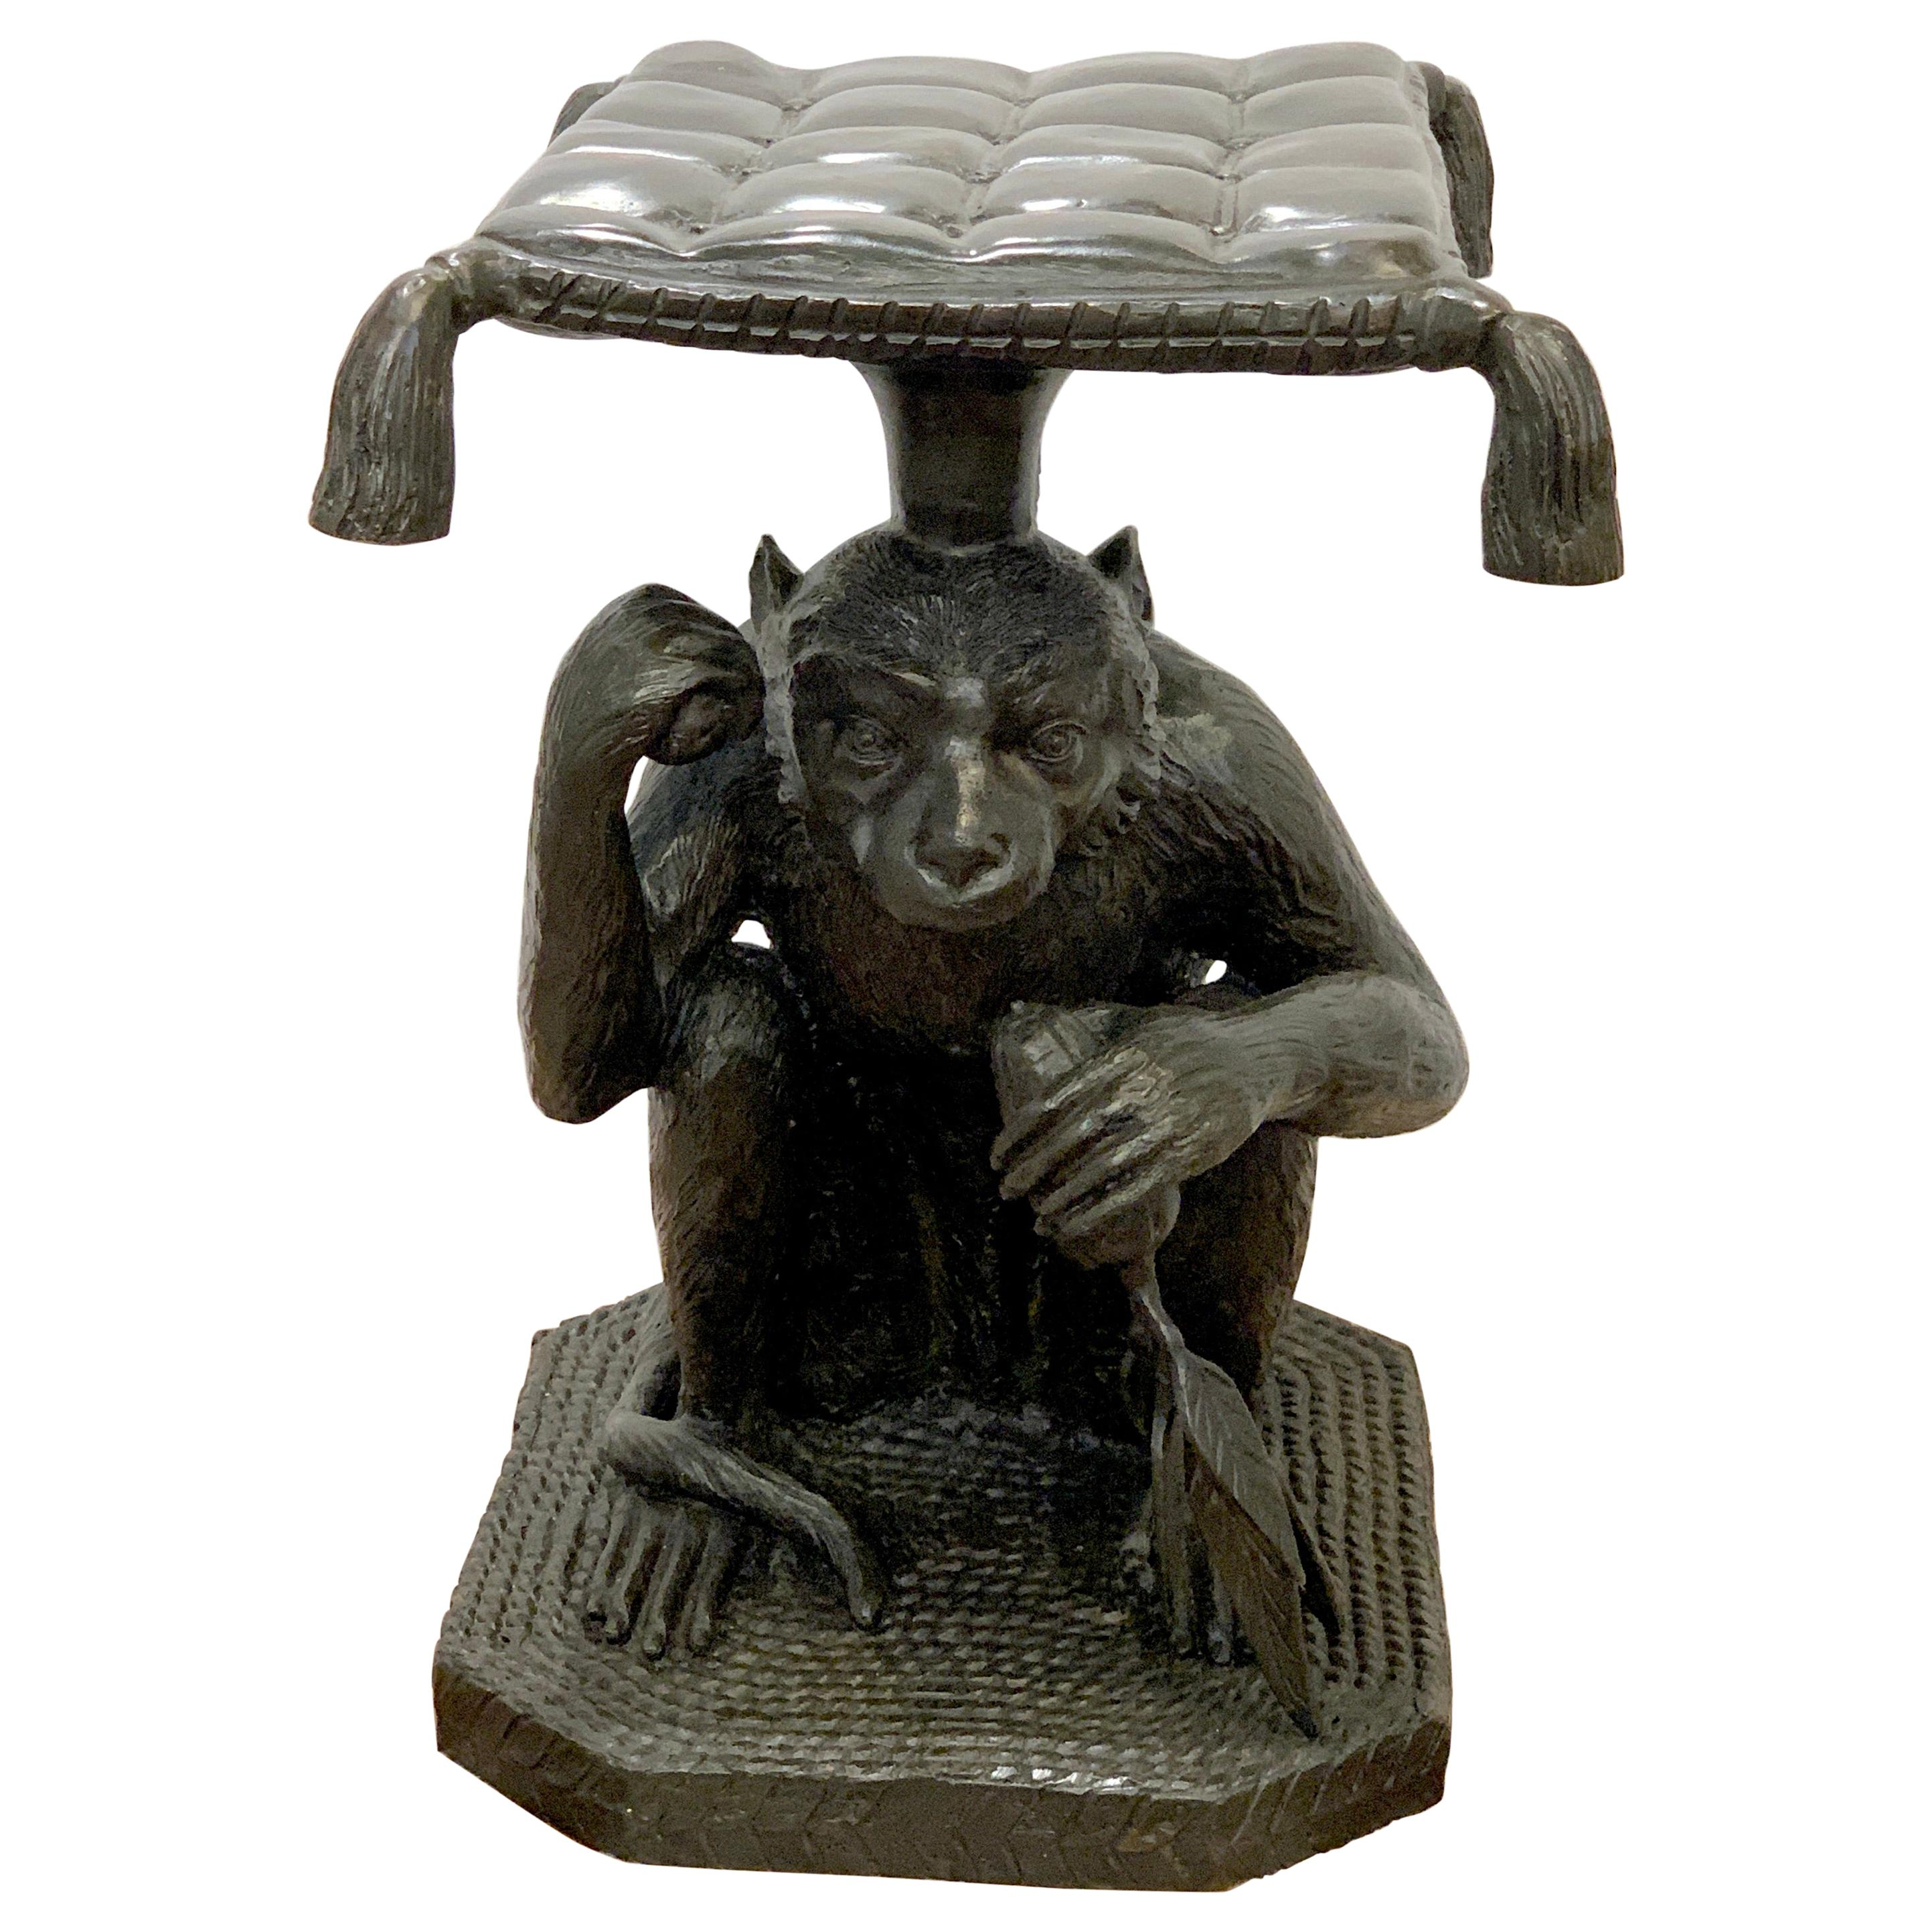 Exotic Bronze Monkey Garden Seat